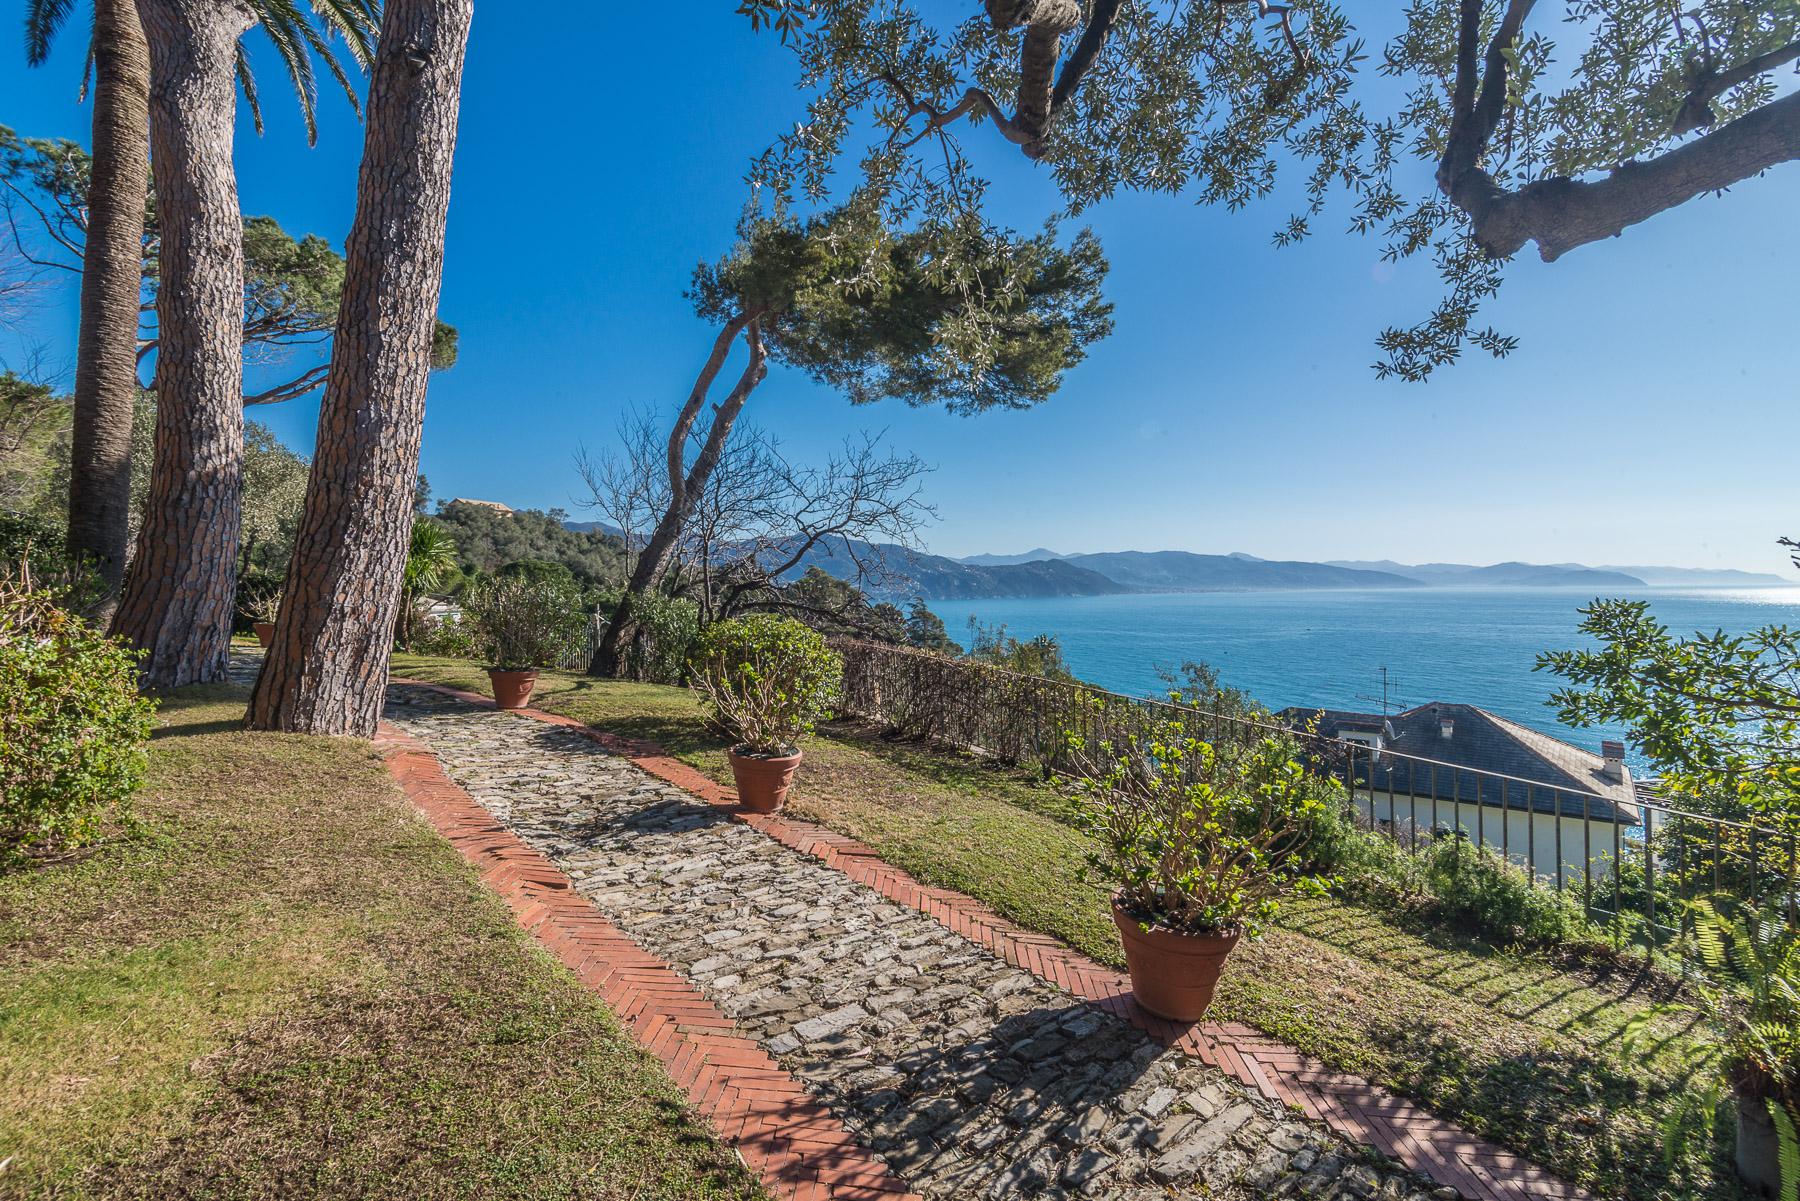 Villa in Vendita a Santa Margherita Ligure: 5 locali, 440 mq - Foto 17